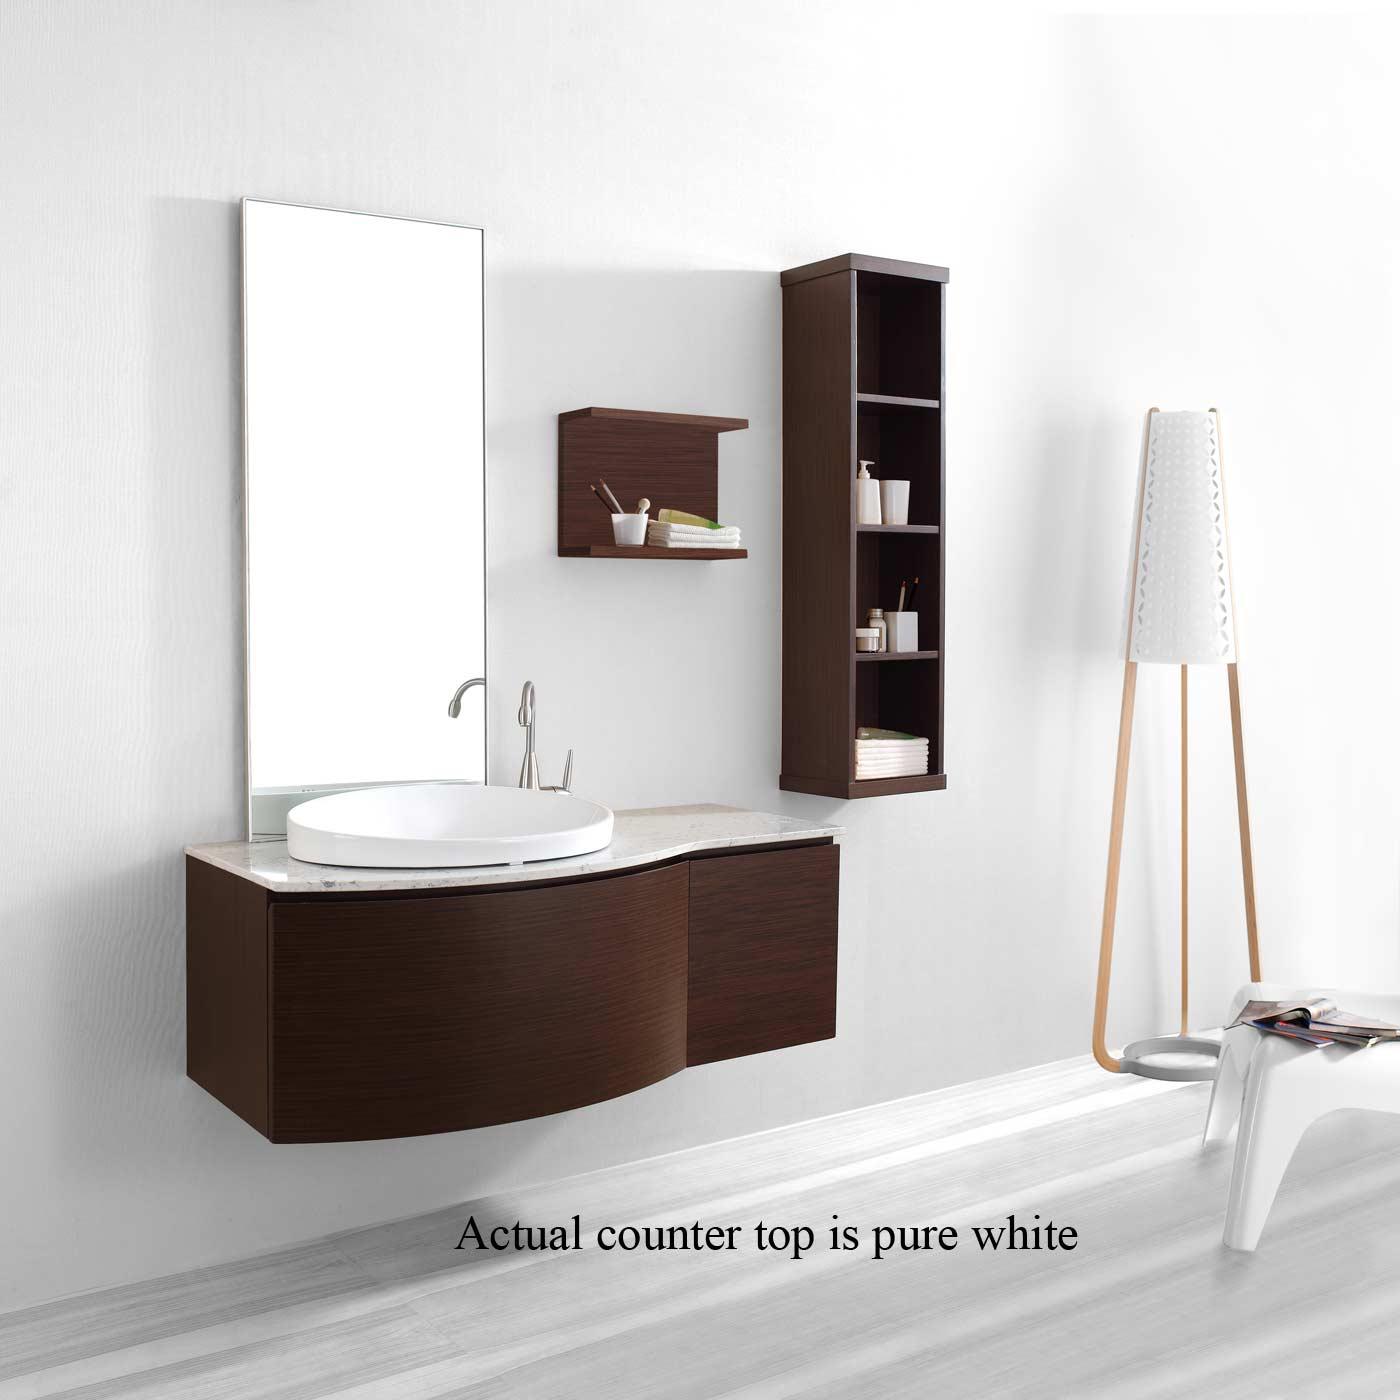 Provence 48  Bathroom Vanity by CBI   NATURAL Iron Wood VM V12033 IRW48  Modern Bathroom Vanity Solid Wood Free Shipping VM V12033 IRW  . Modern Bathroom Vanities Ft Lauderdale. Home Design Ideas